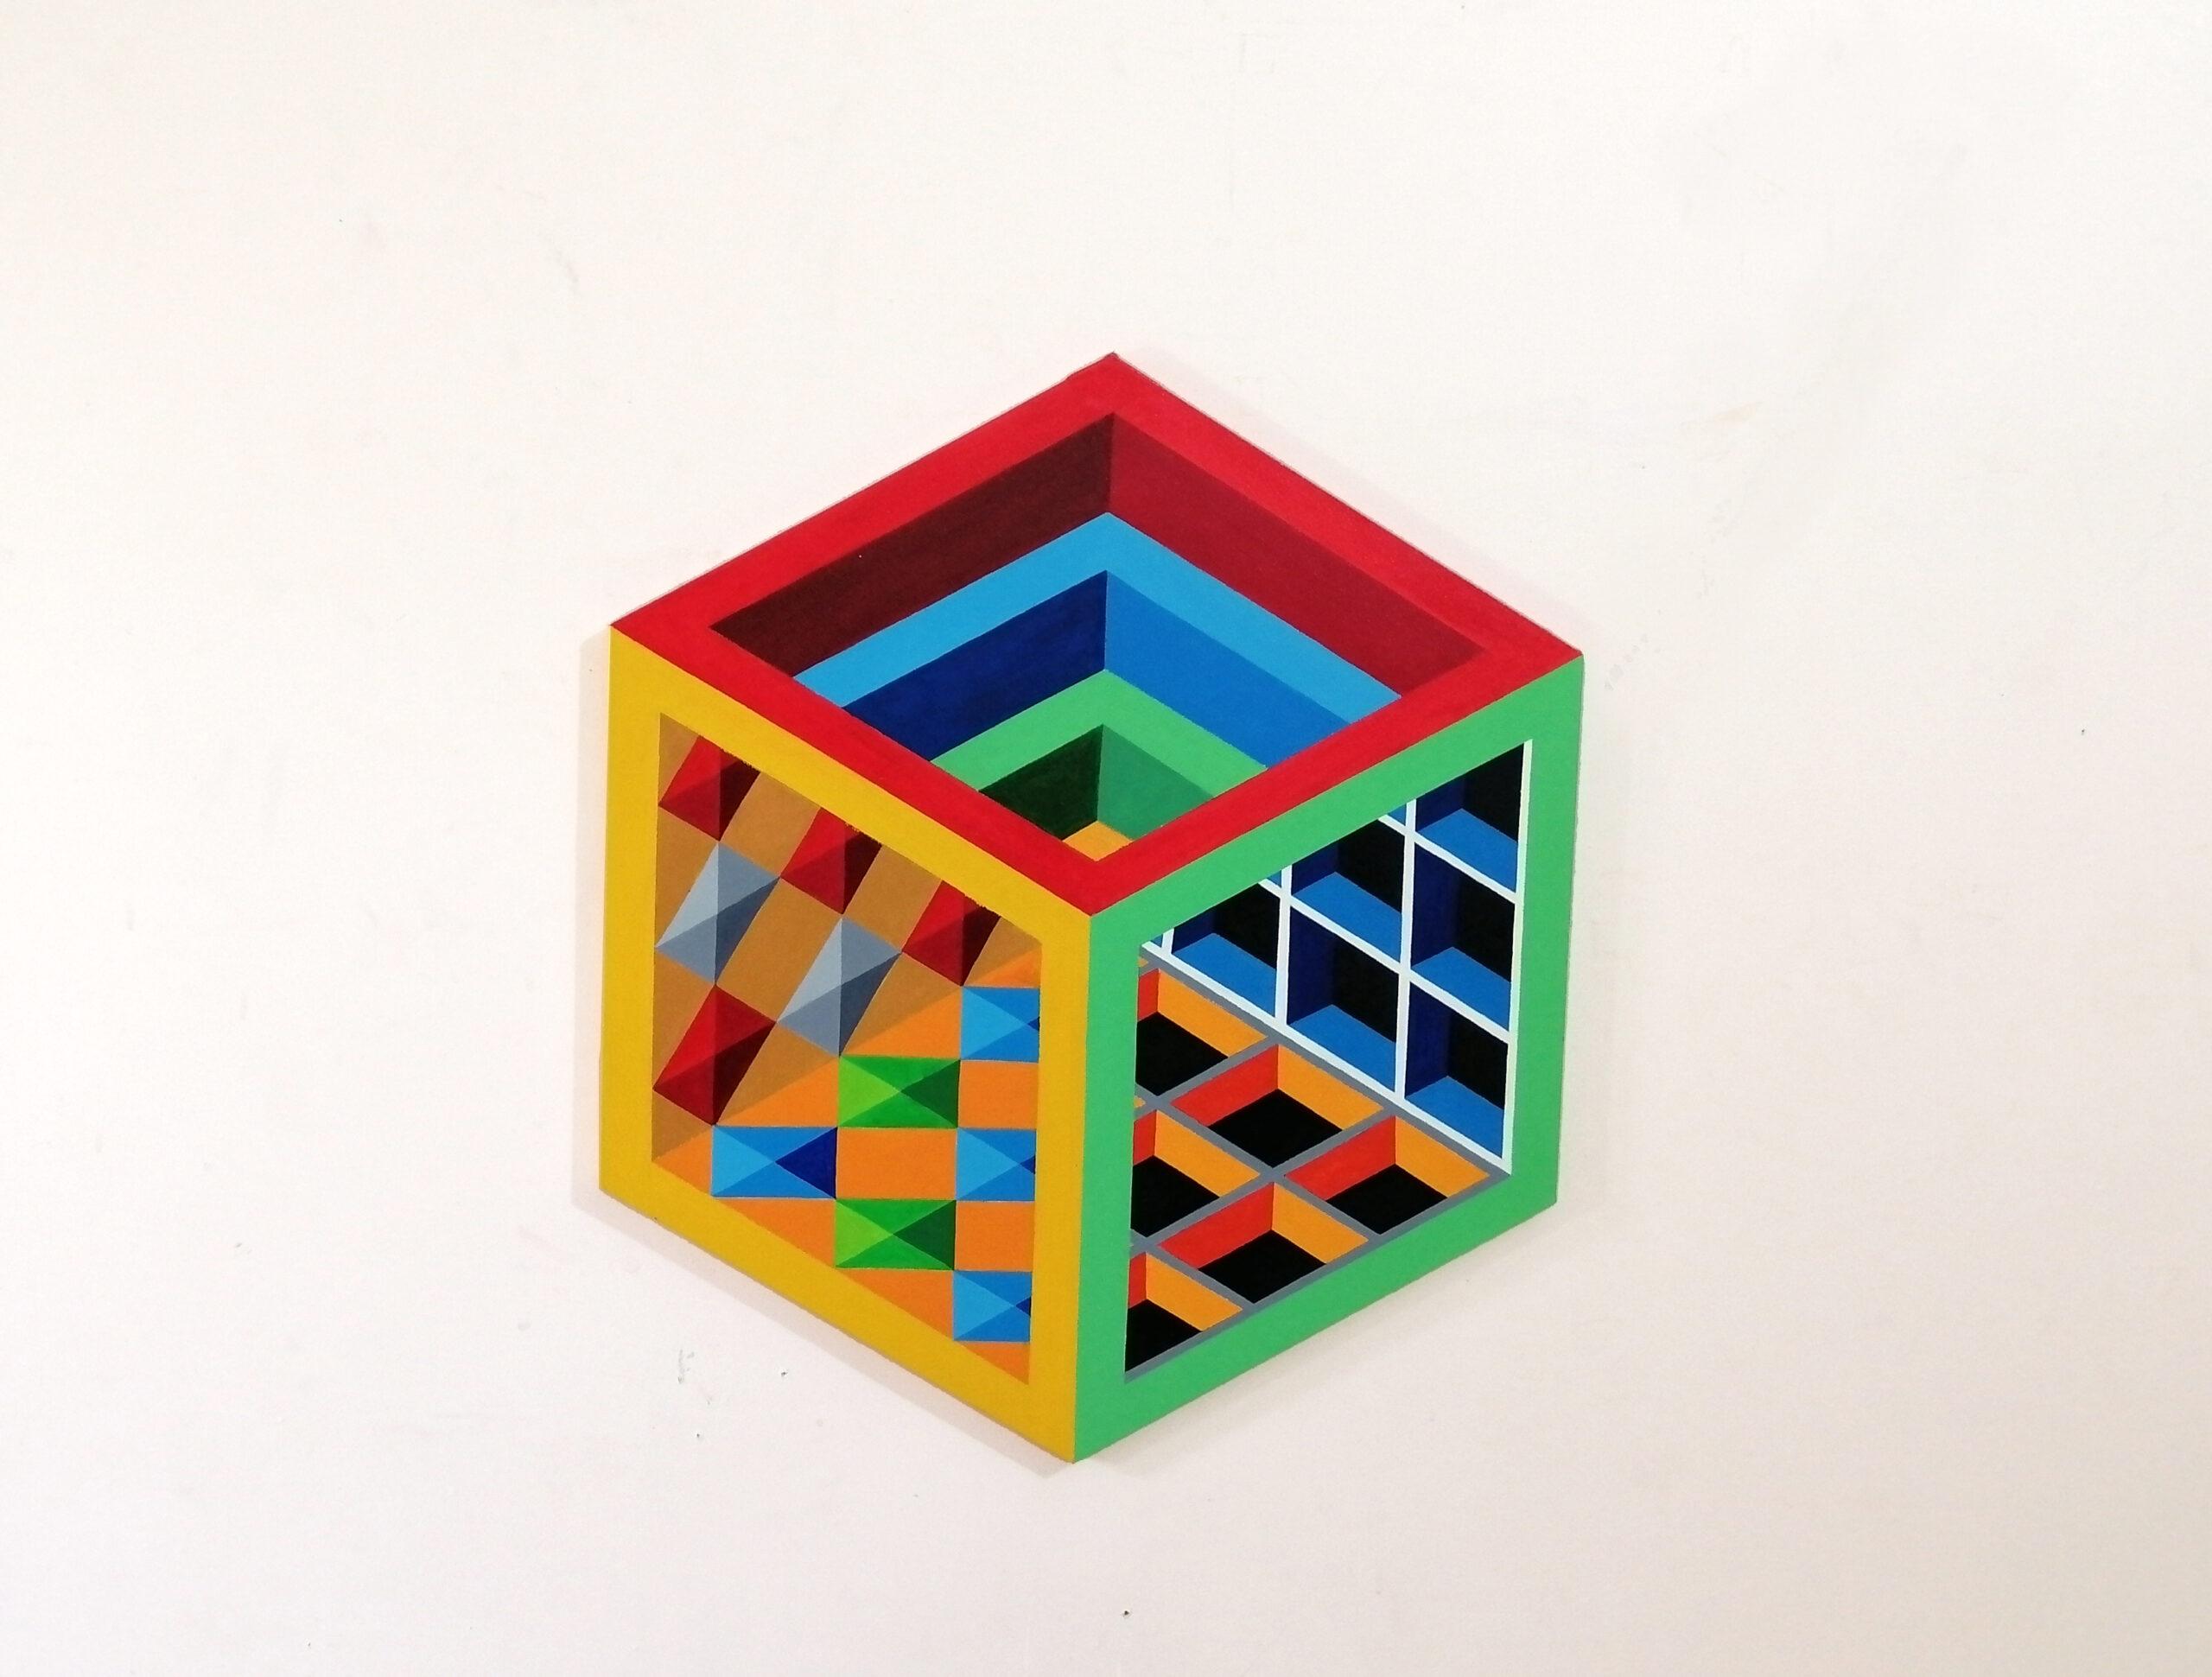 "Obaid Ur Rahman<br></br>Inside Out<br></br>Acrylics on Canvas<br></br>12""x12""x12"" (hexagon)"